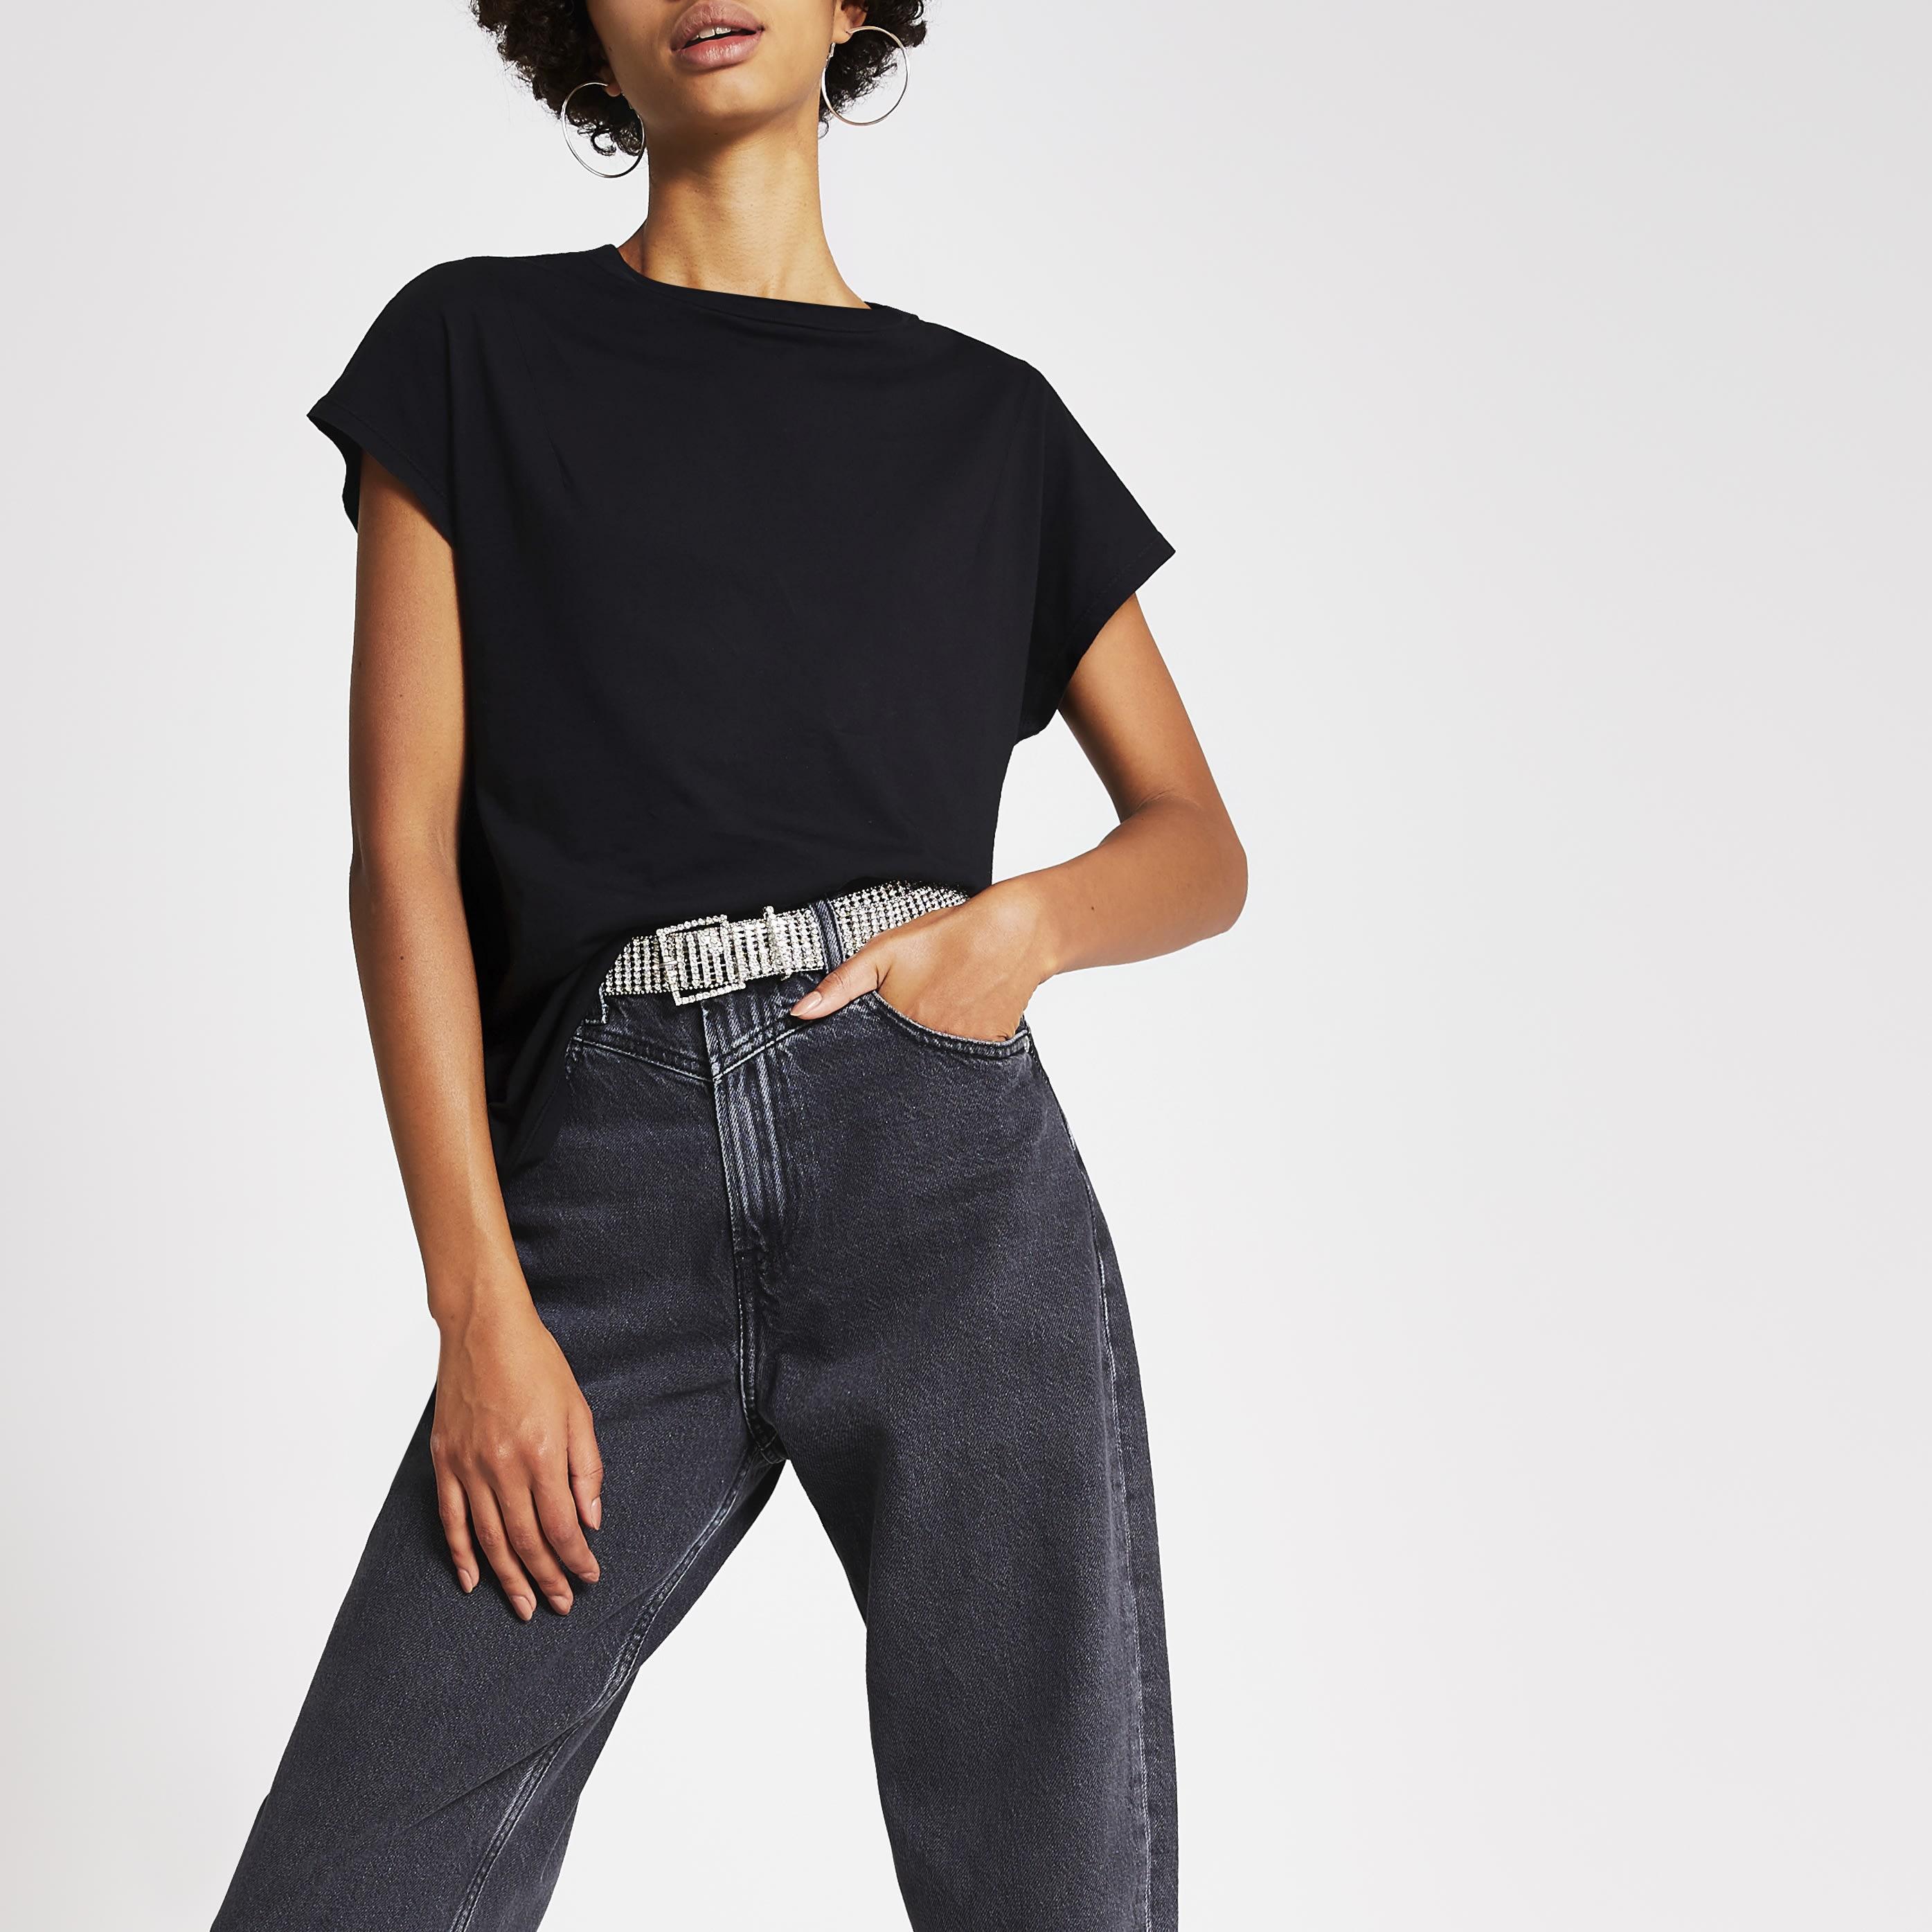 River Island Womens Dua Lipa x Pepe Jeans Black T-shirt (XS)